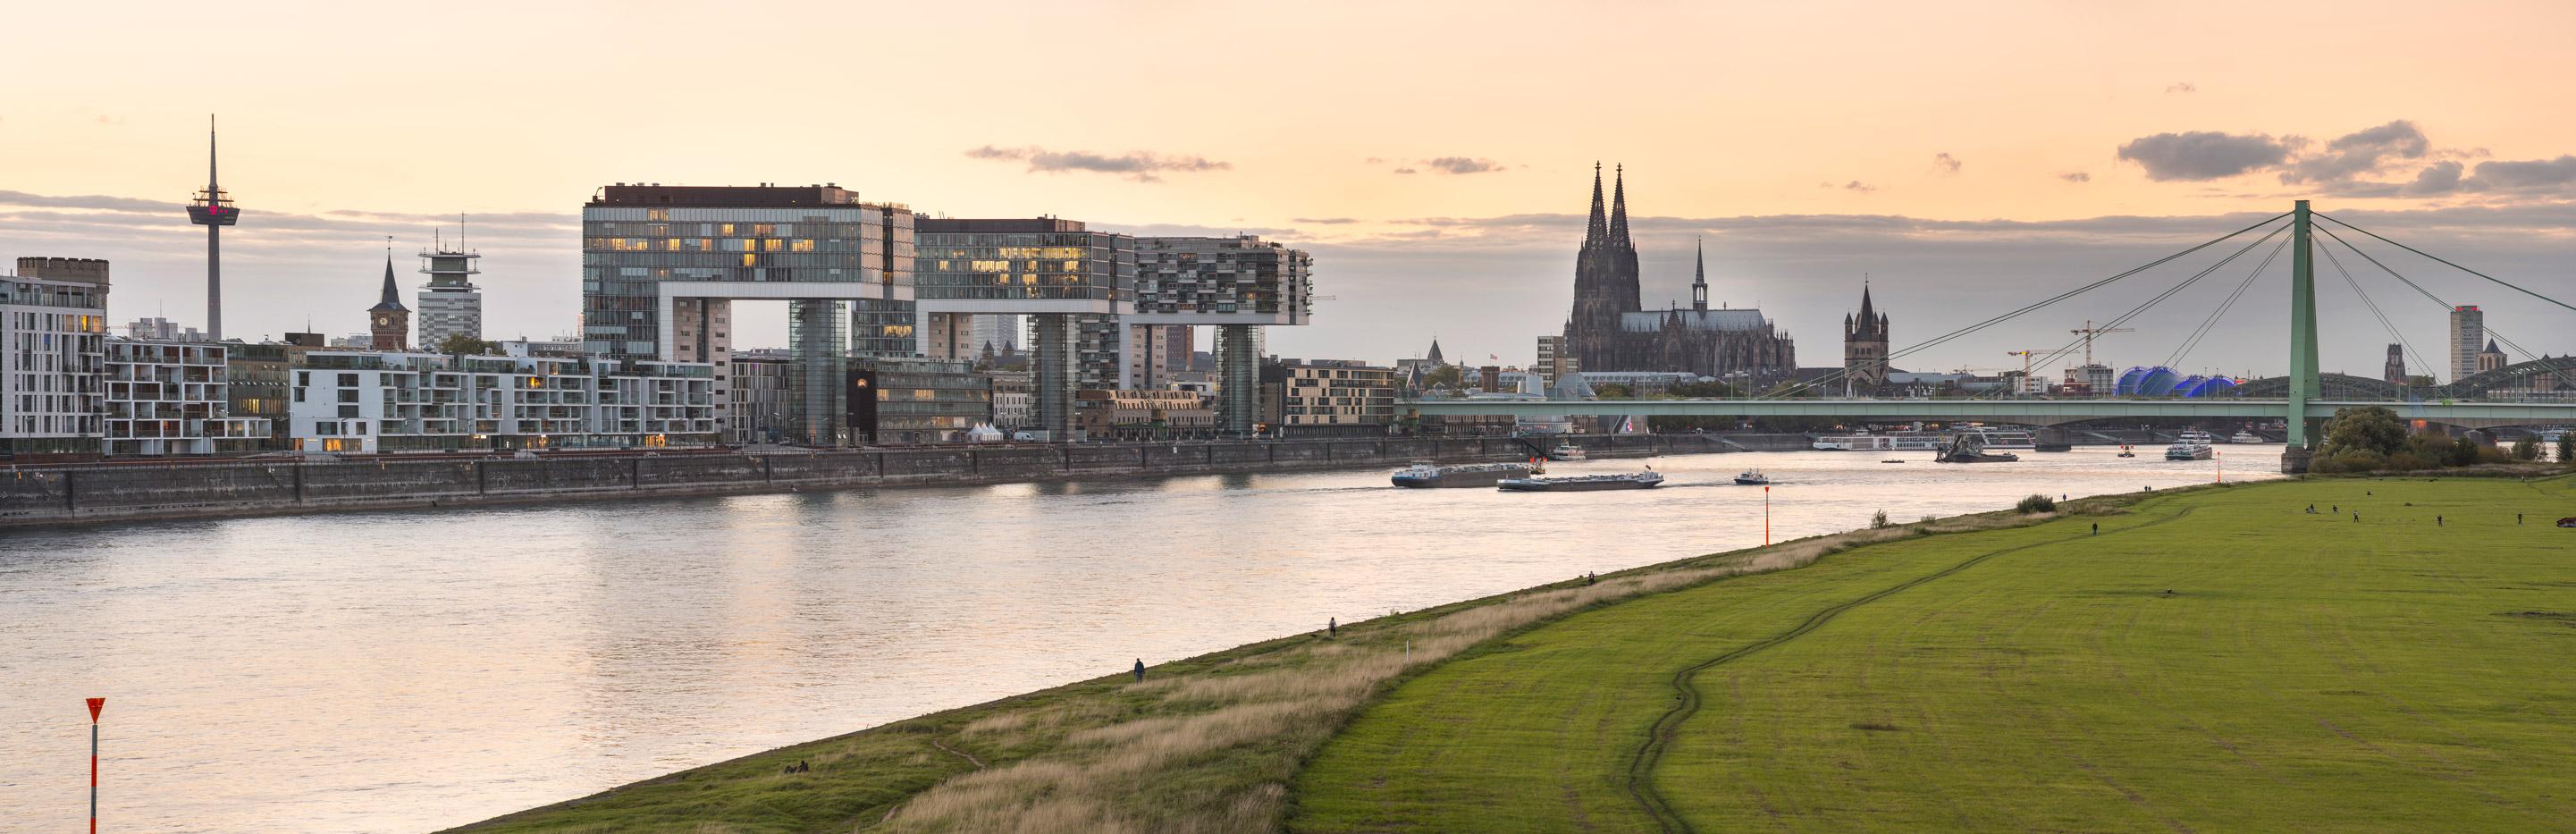 Köln-Panorama Kranhäuser, Dom